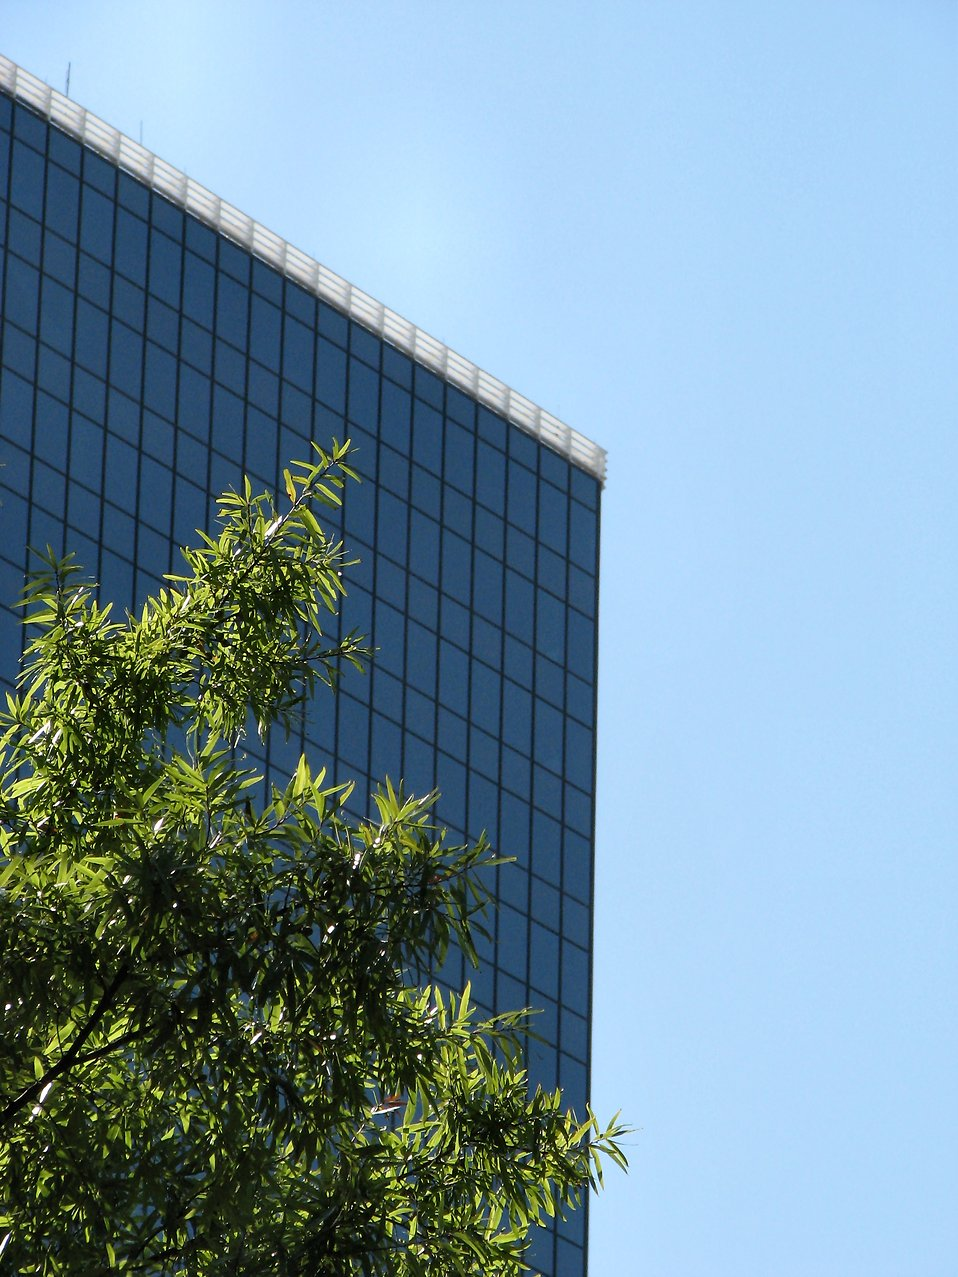 Modern glass building : Free Stock Photo